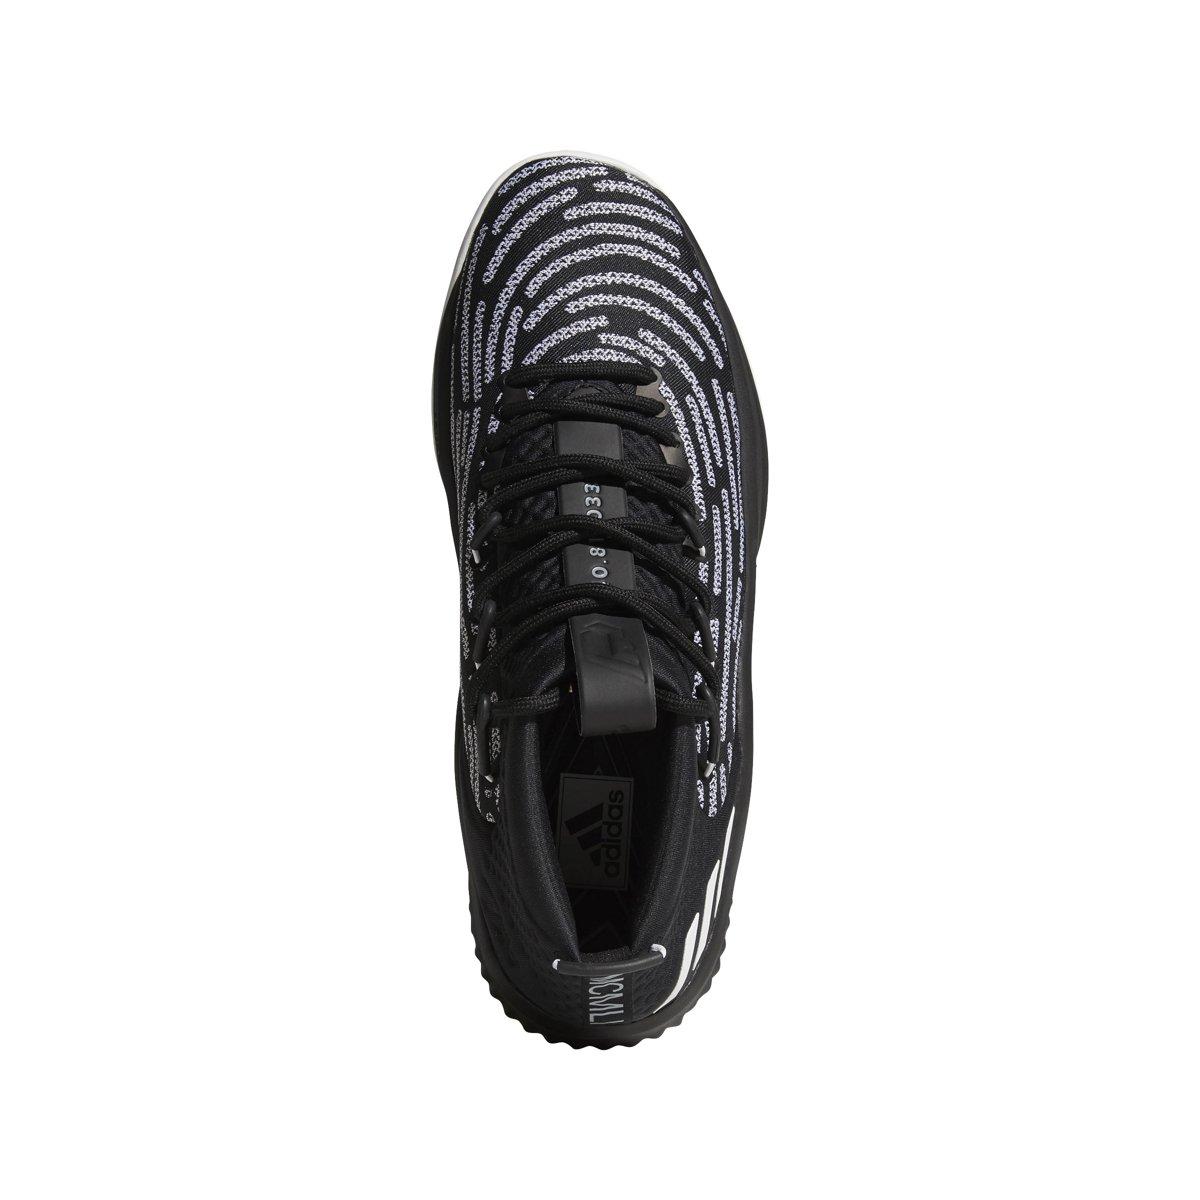 the latest 6afff ceea6 Amazon.com  adidas Dame 4 Black History Month Shoe - Mens Basketball   Basketball